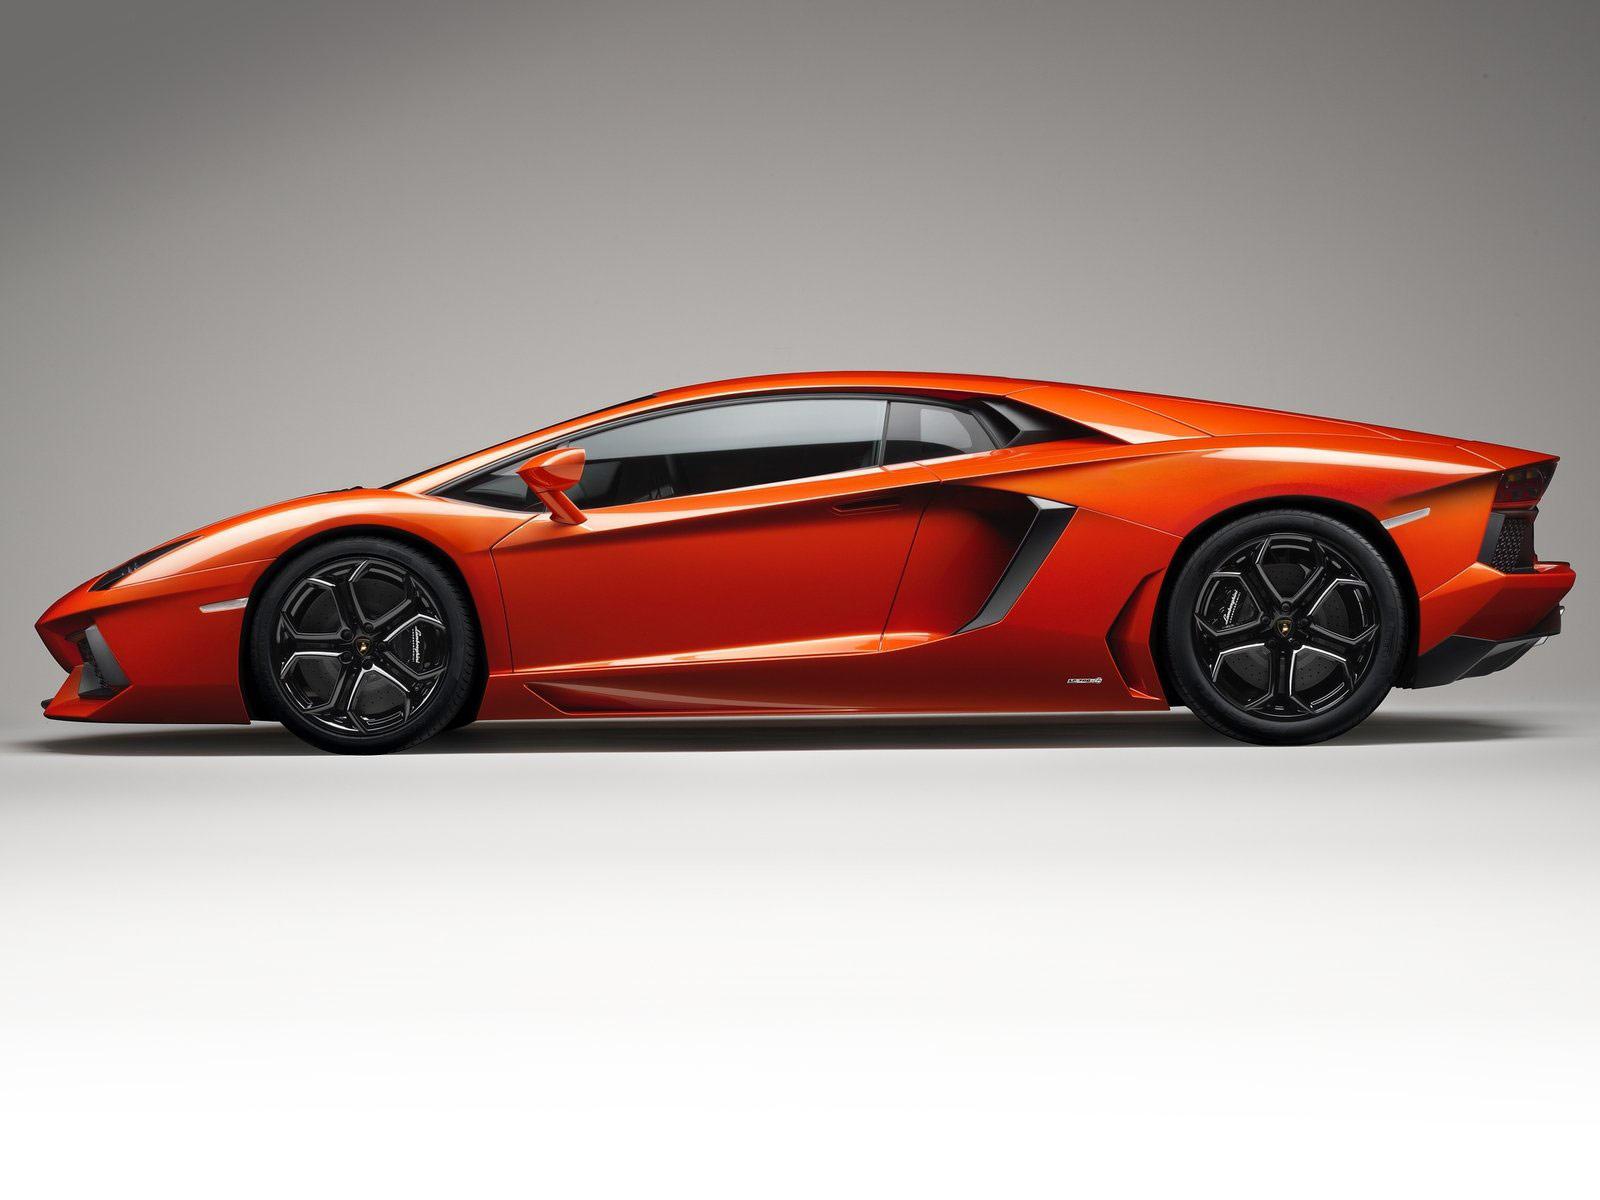 Lambang Mobil Lamborghini Lamborghini Mobile Wallpaper